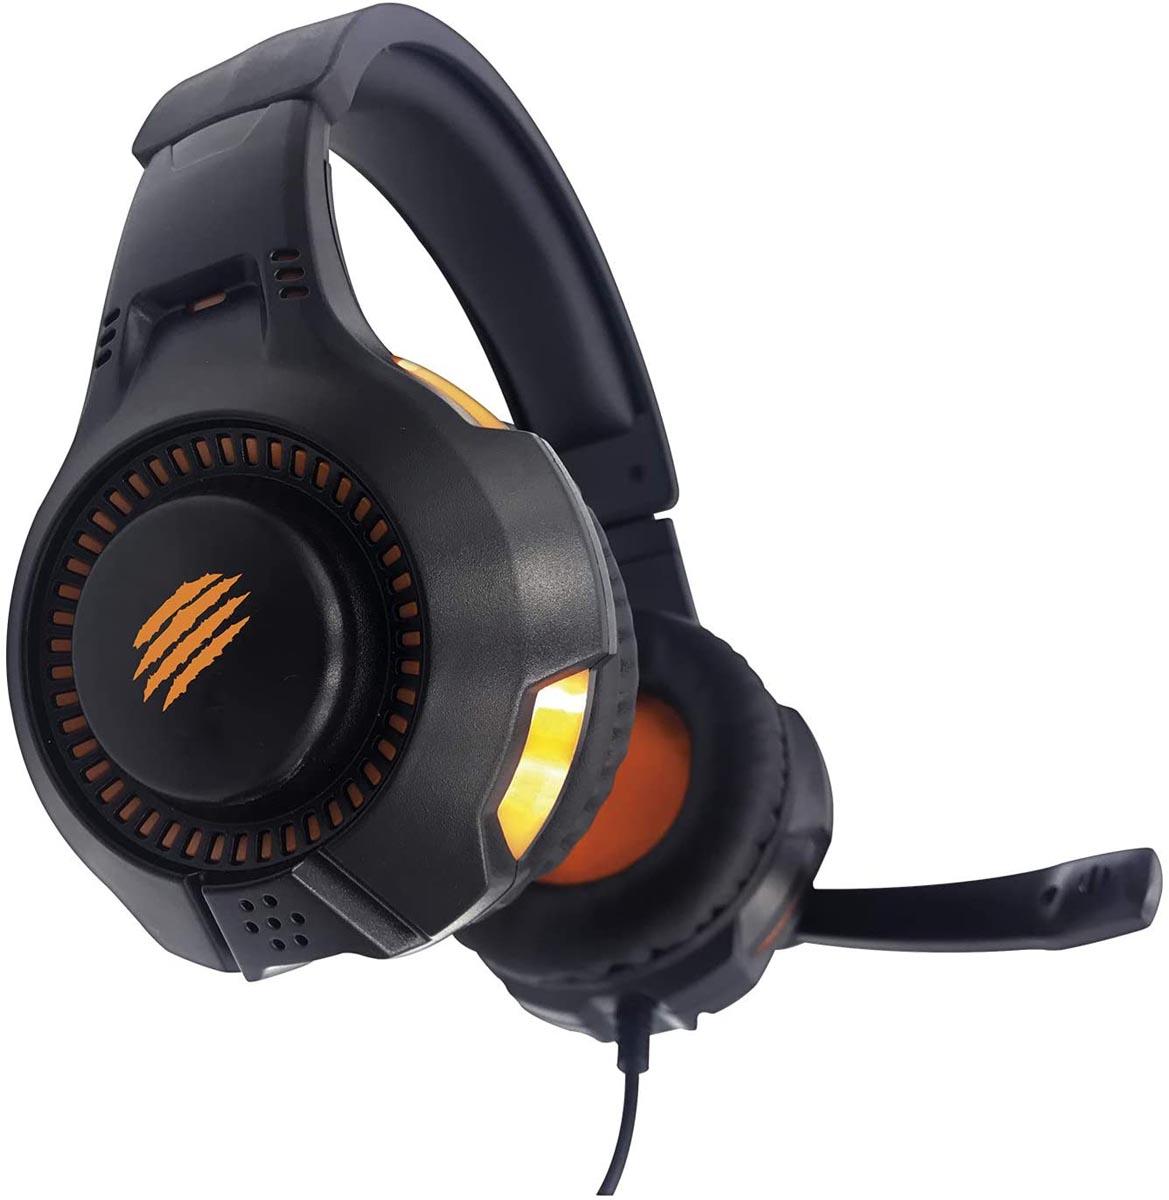 Headset Gamer Gorky para PS4 PC XBOX One Nitendo Switch OEX HS 413